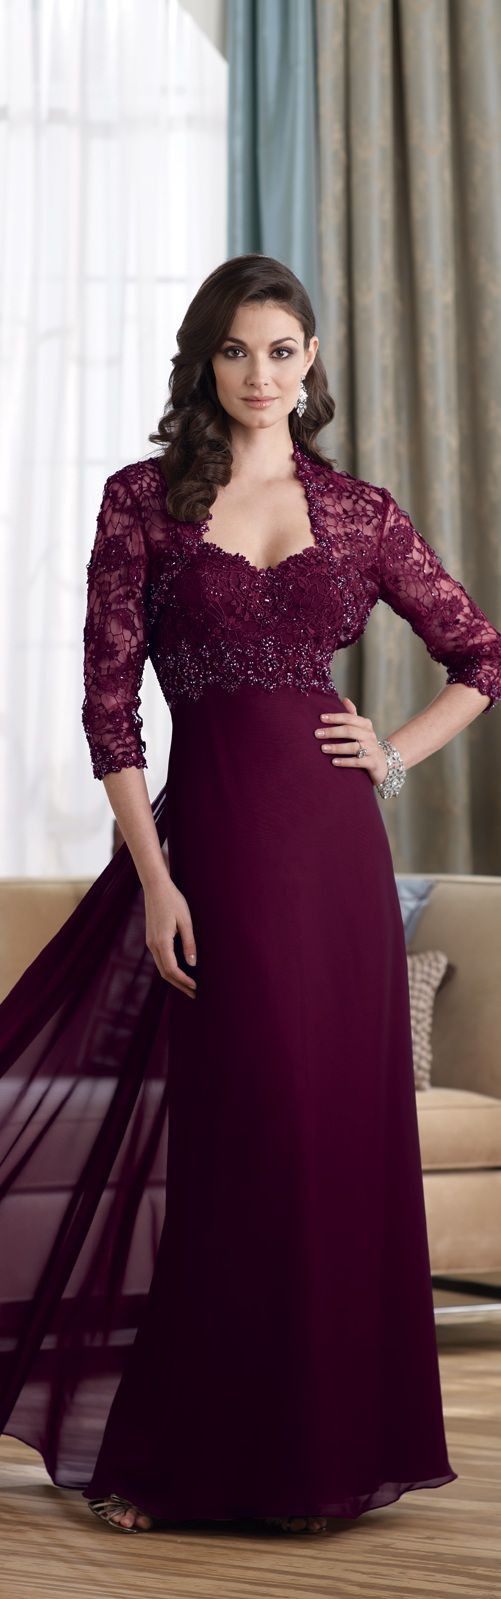 Fashion Gown - http://www.inews-news.com/women-s-world.html